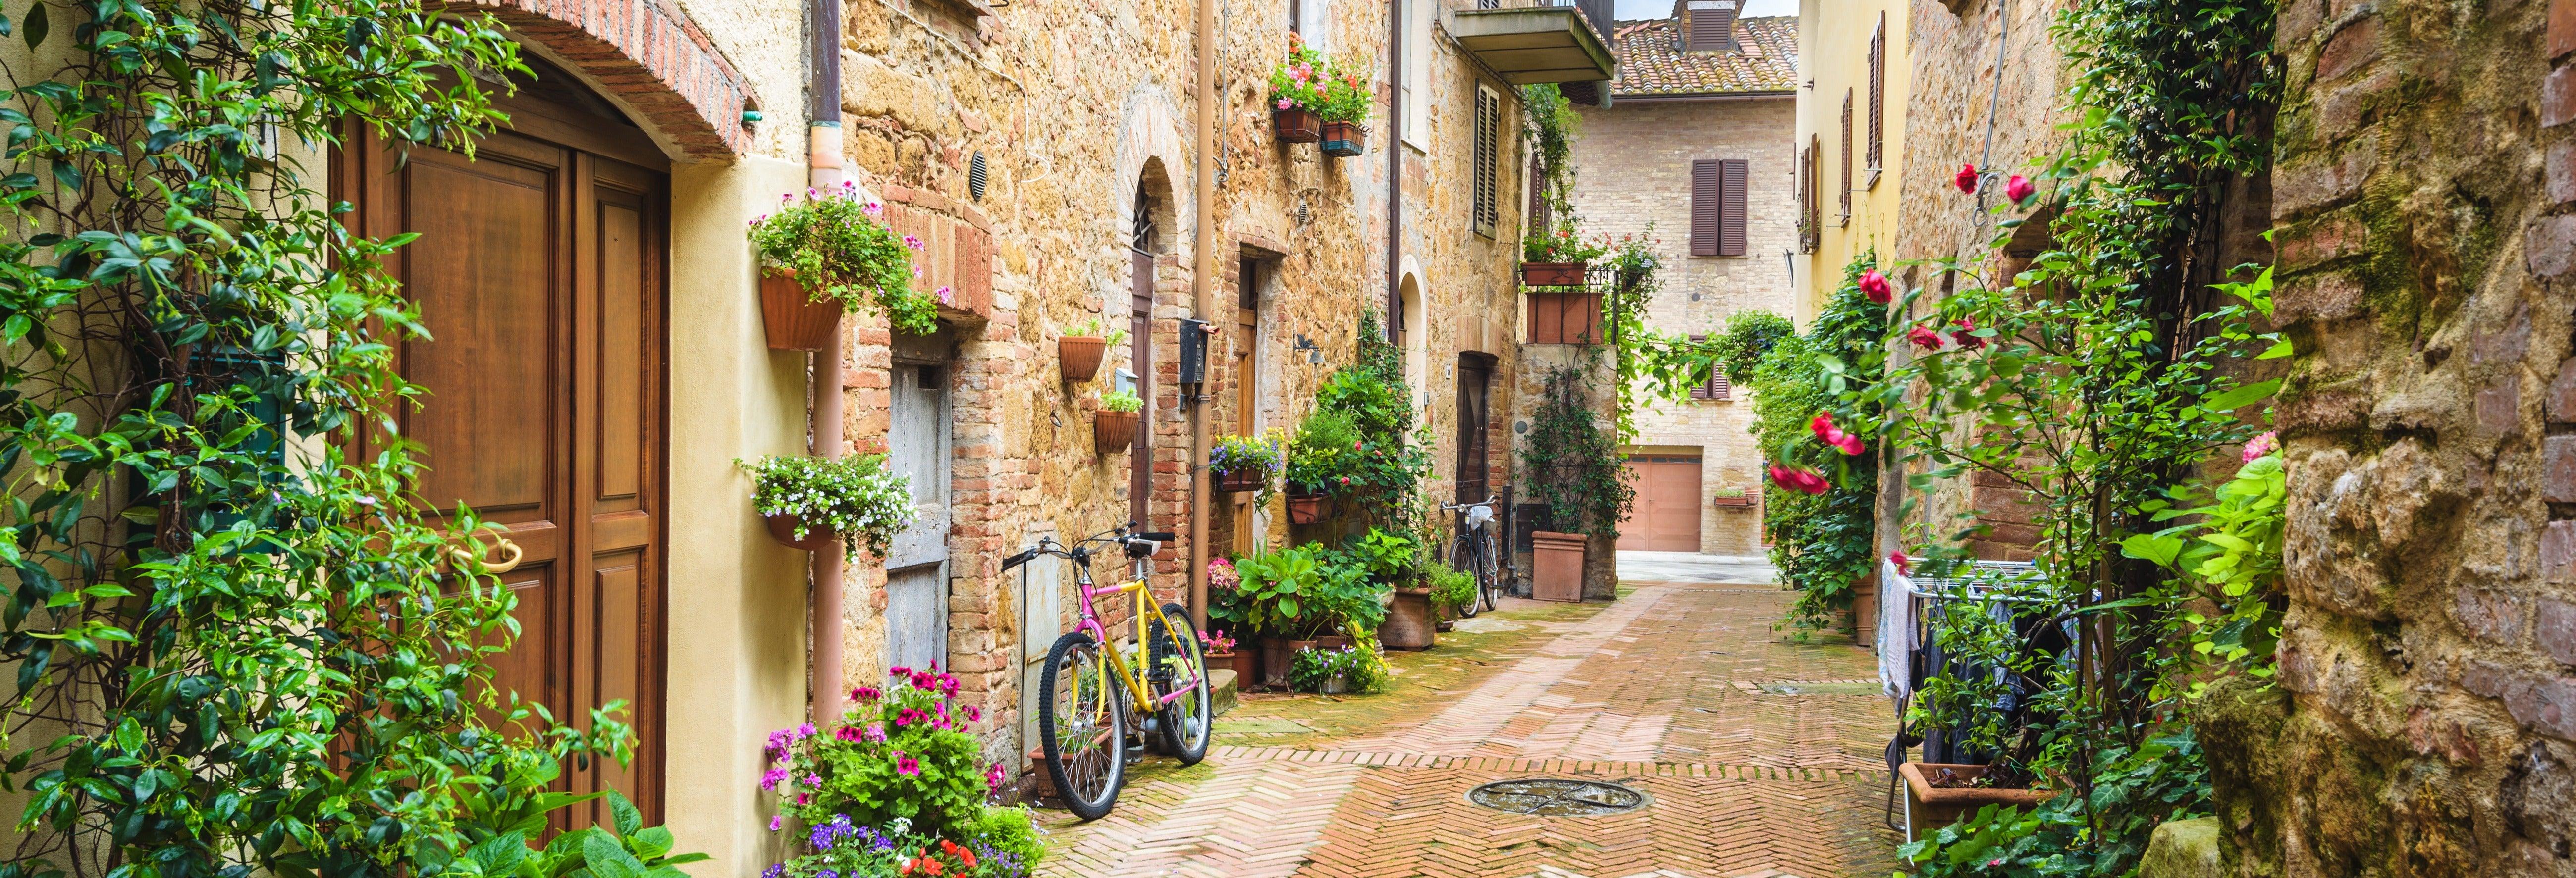 Montalcino, Pienza, Montepulciano Day Trip